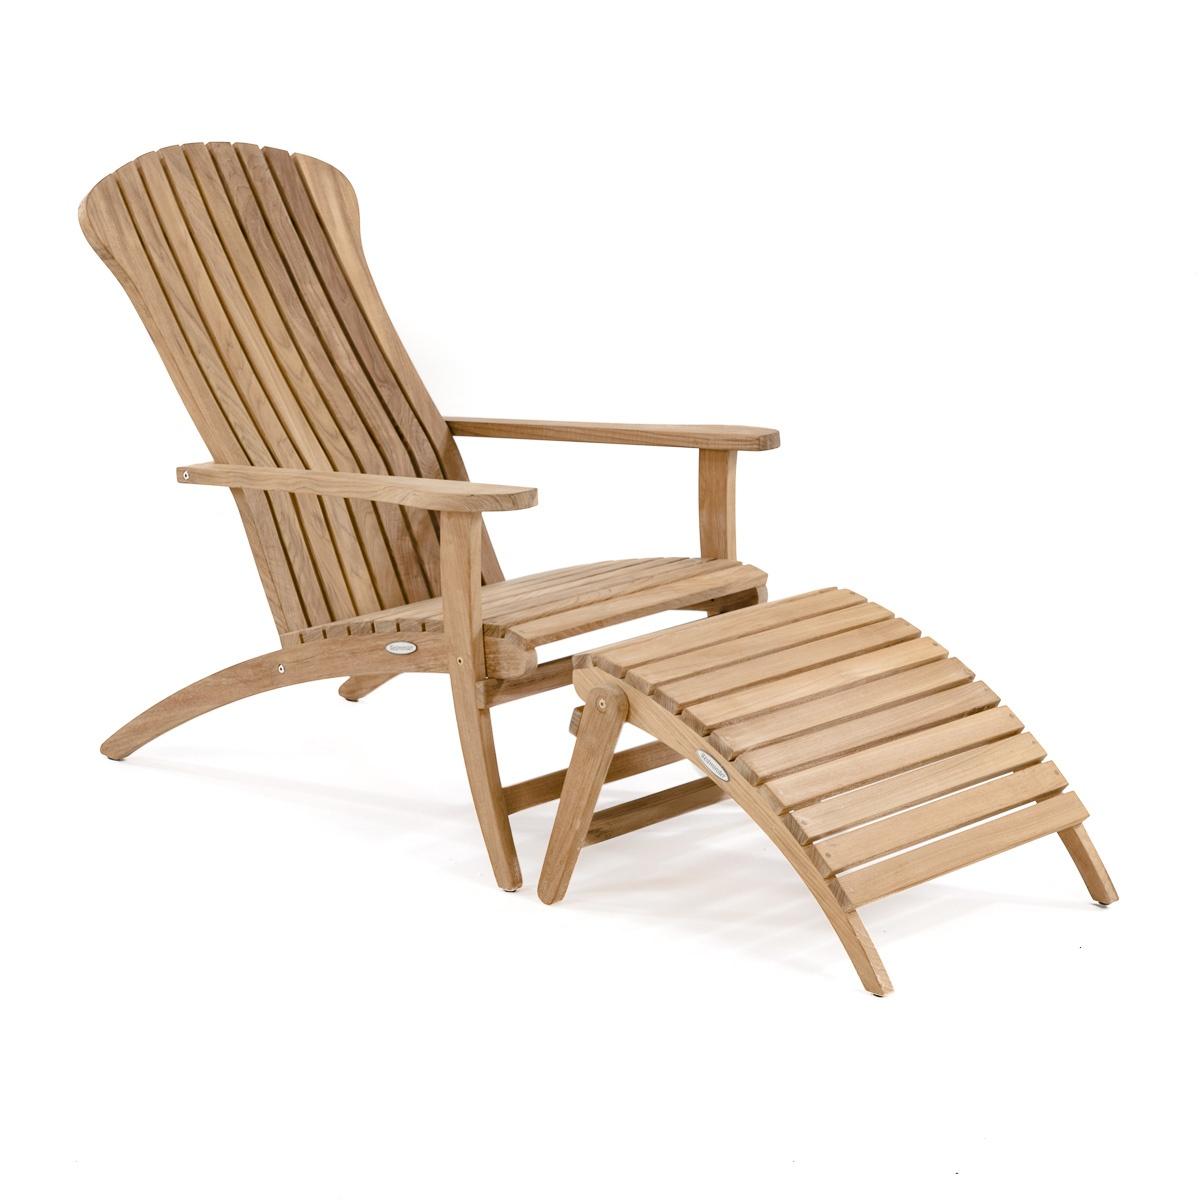 Westminster Adirondack Westminster Teak Outdoor Furniture